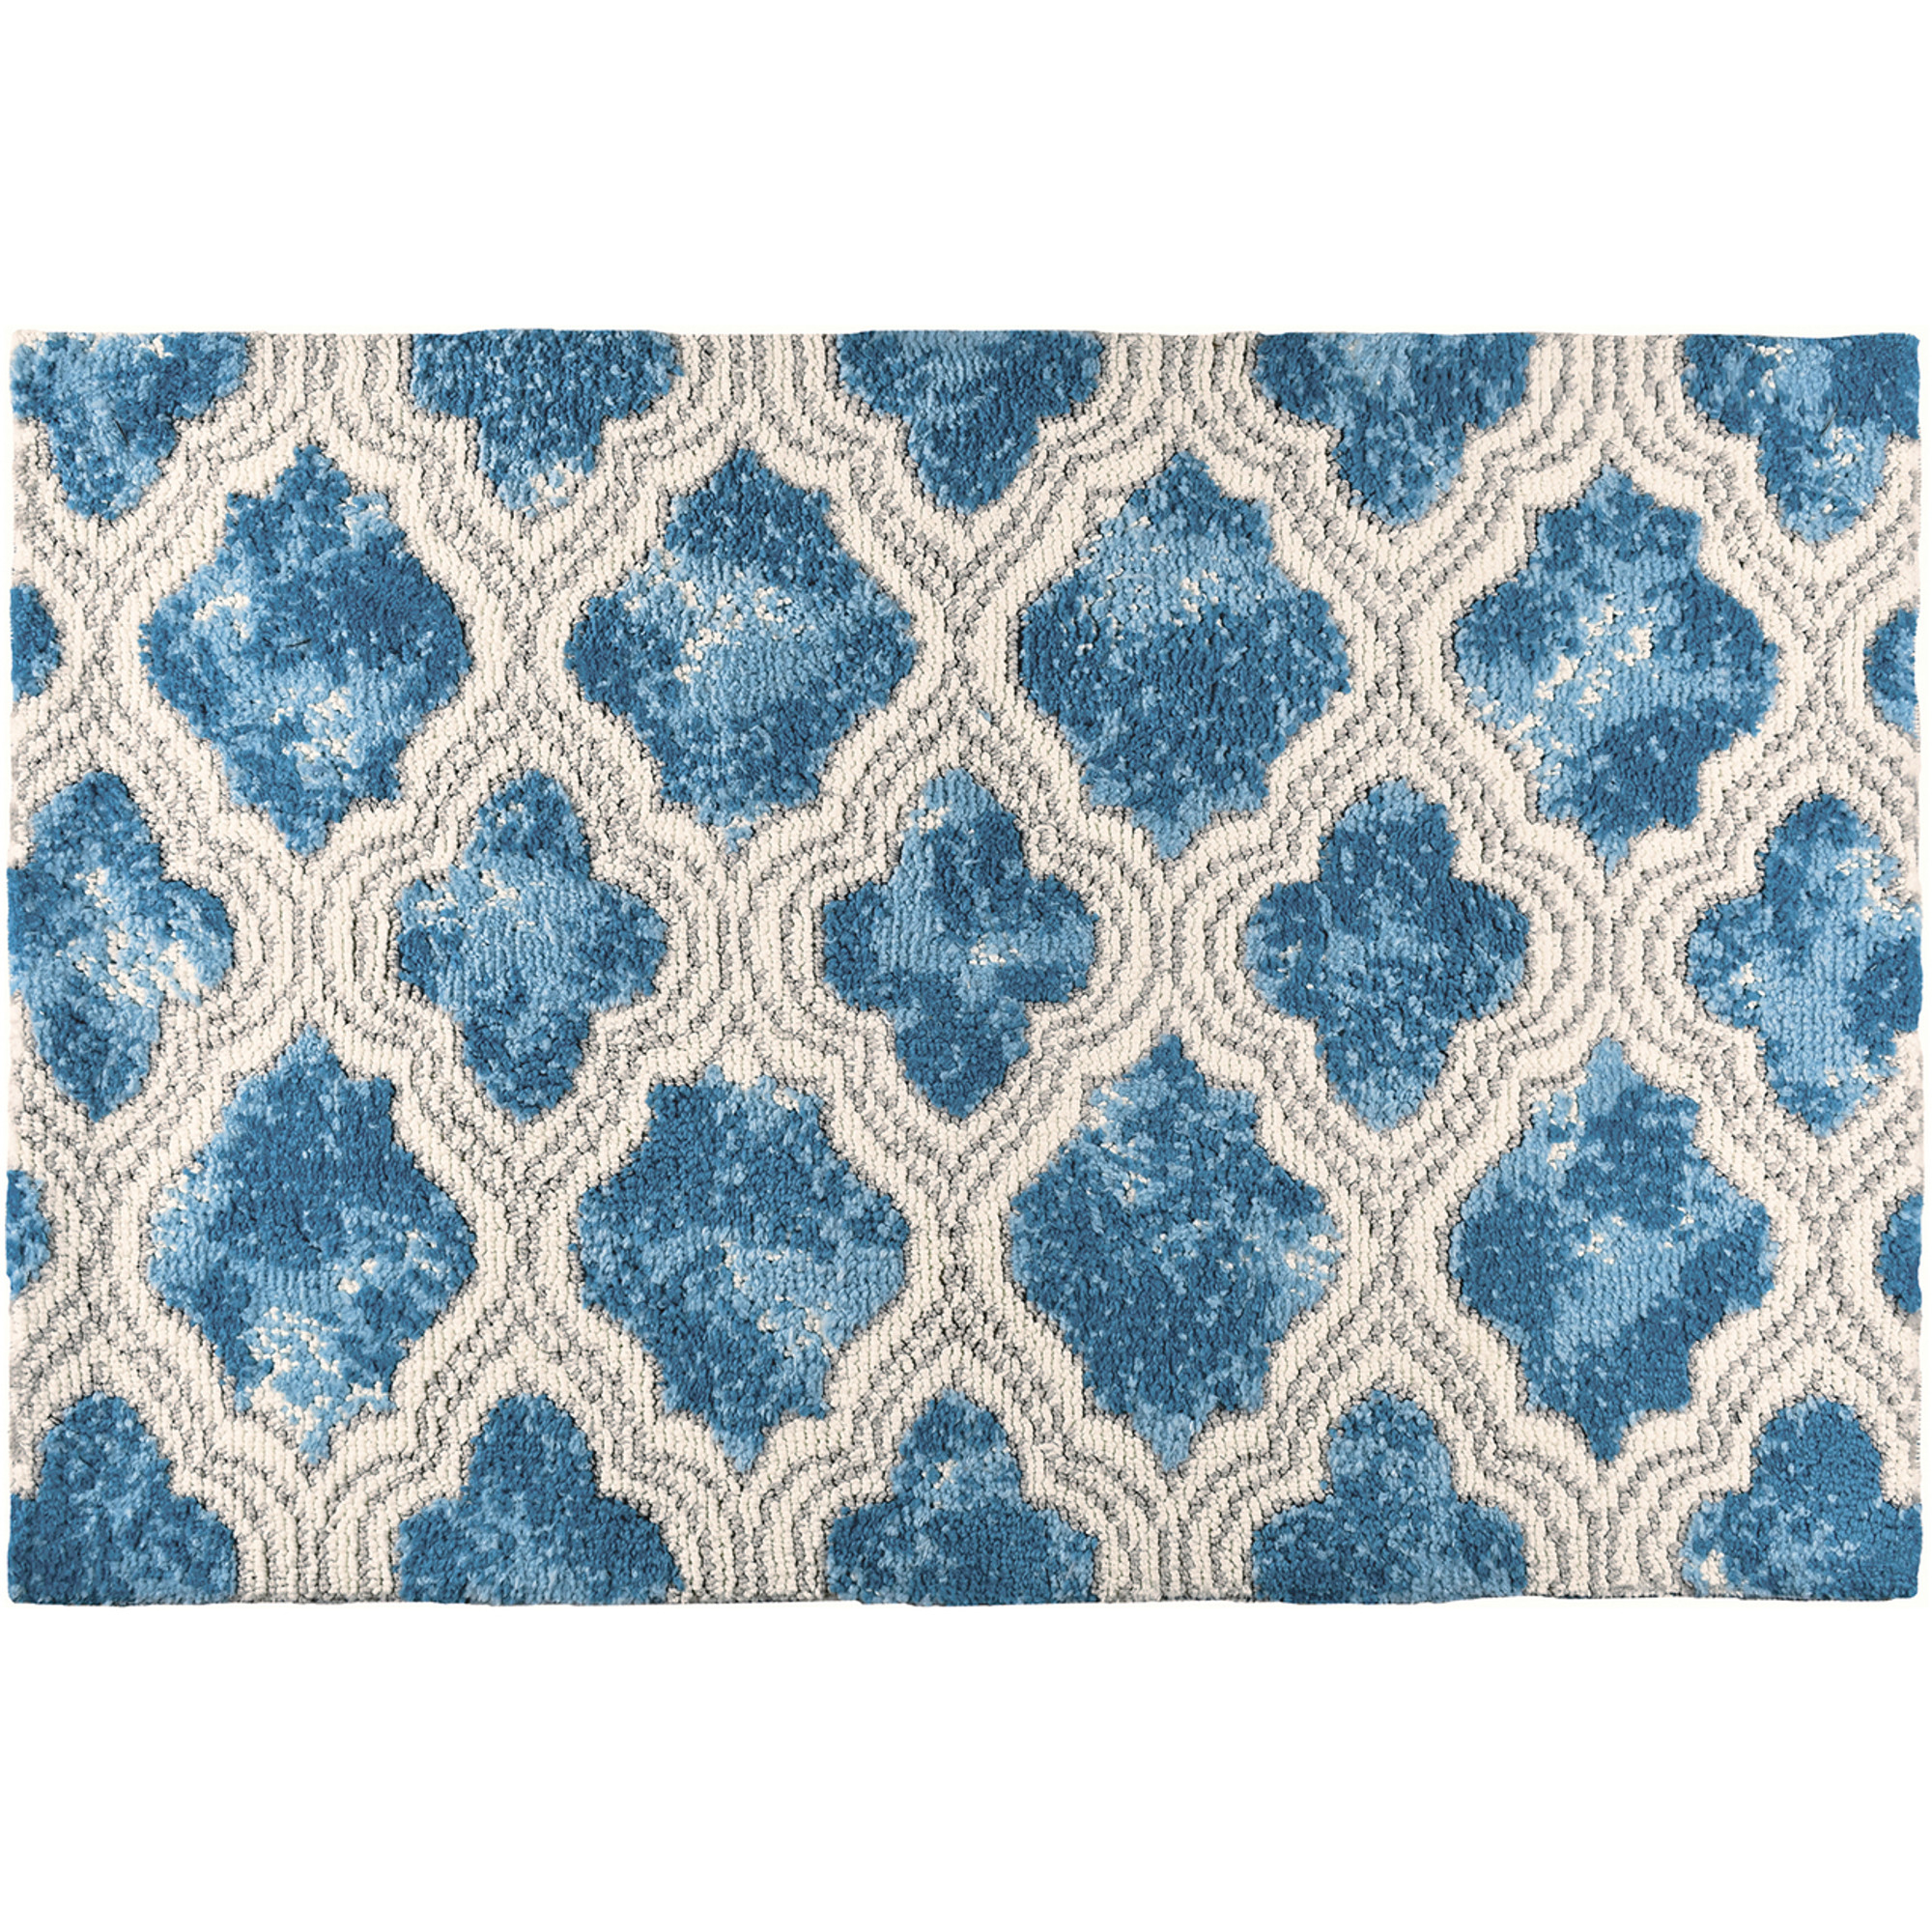 Marrakesh Tile